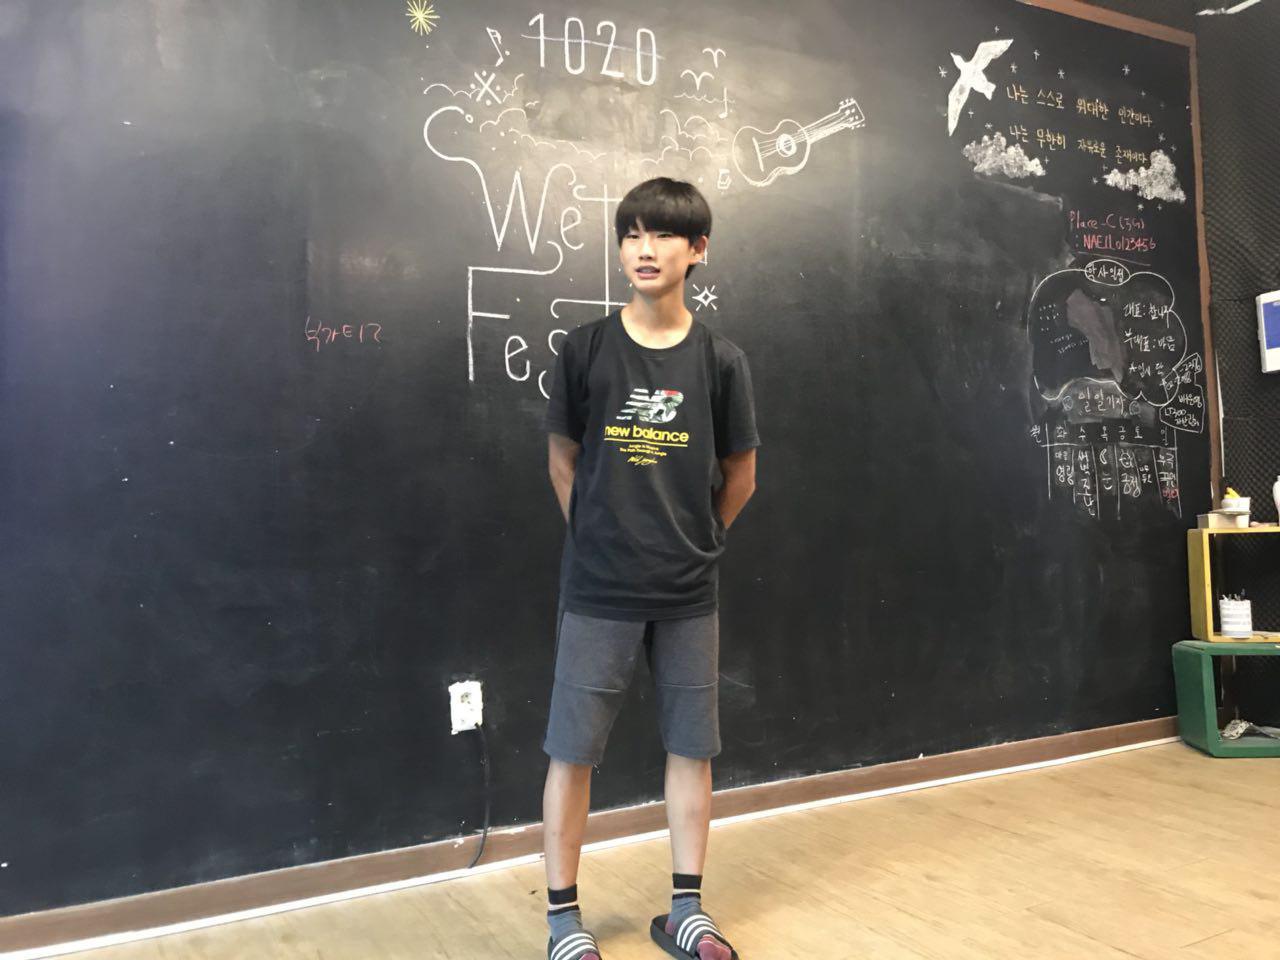 photo_2018-08-10_17-12-01.jpg